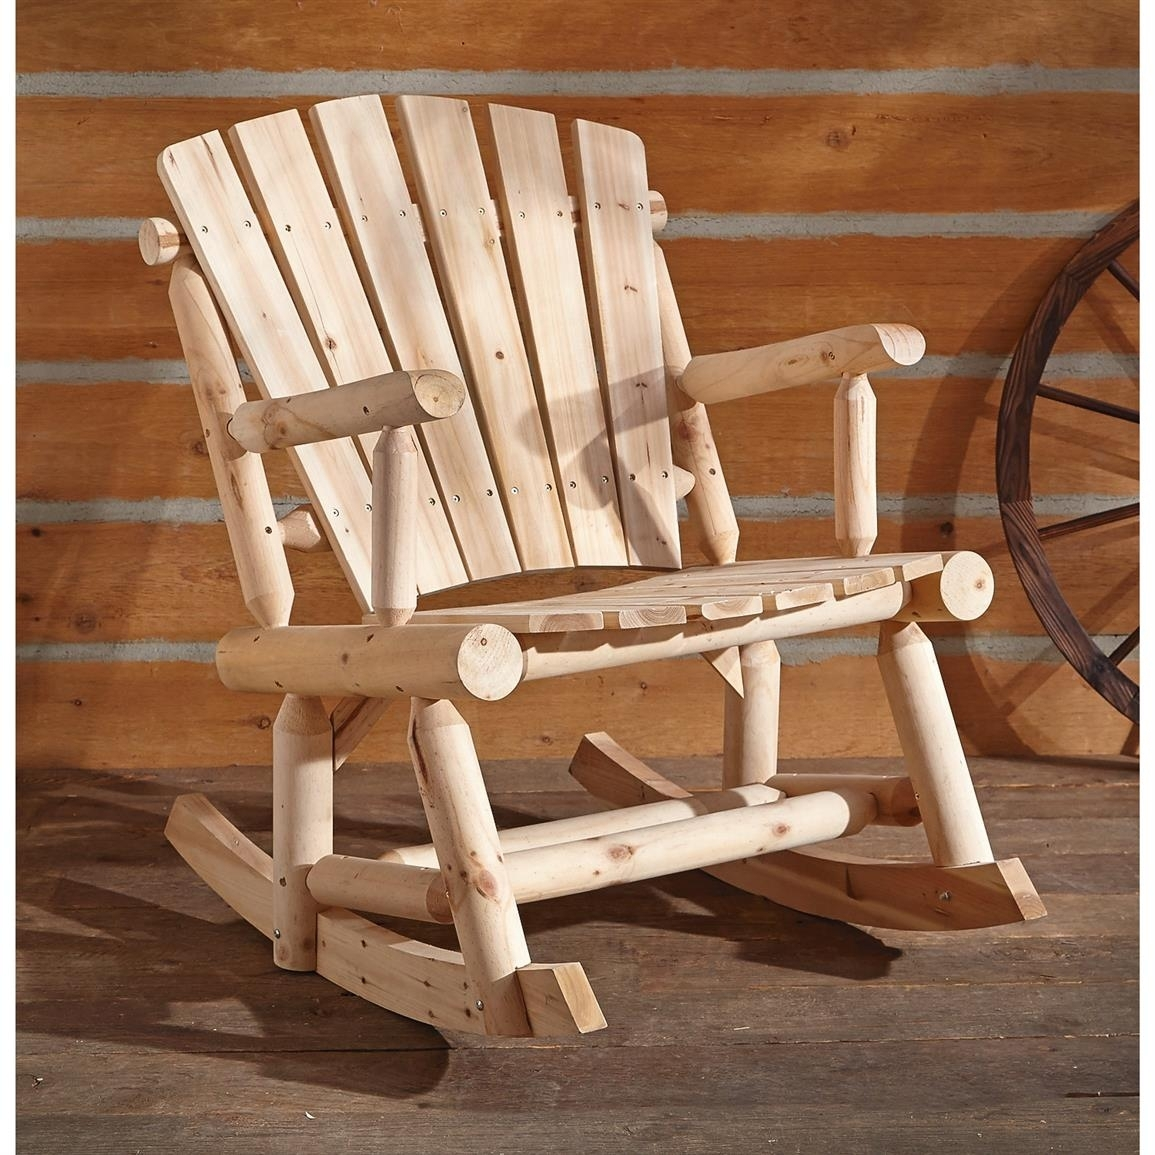 Castlecreek Oversized Adirondack Rocking Chair – 657797, Patio Regarding Oversized Patio Rocking Chairs (View 5 of 15)